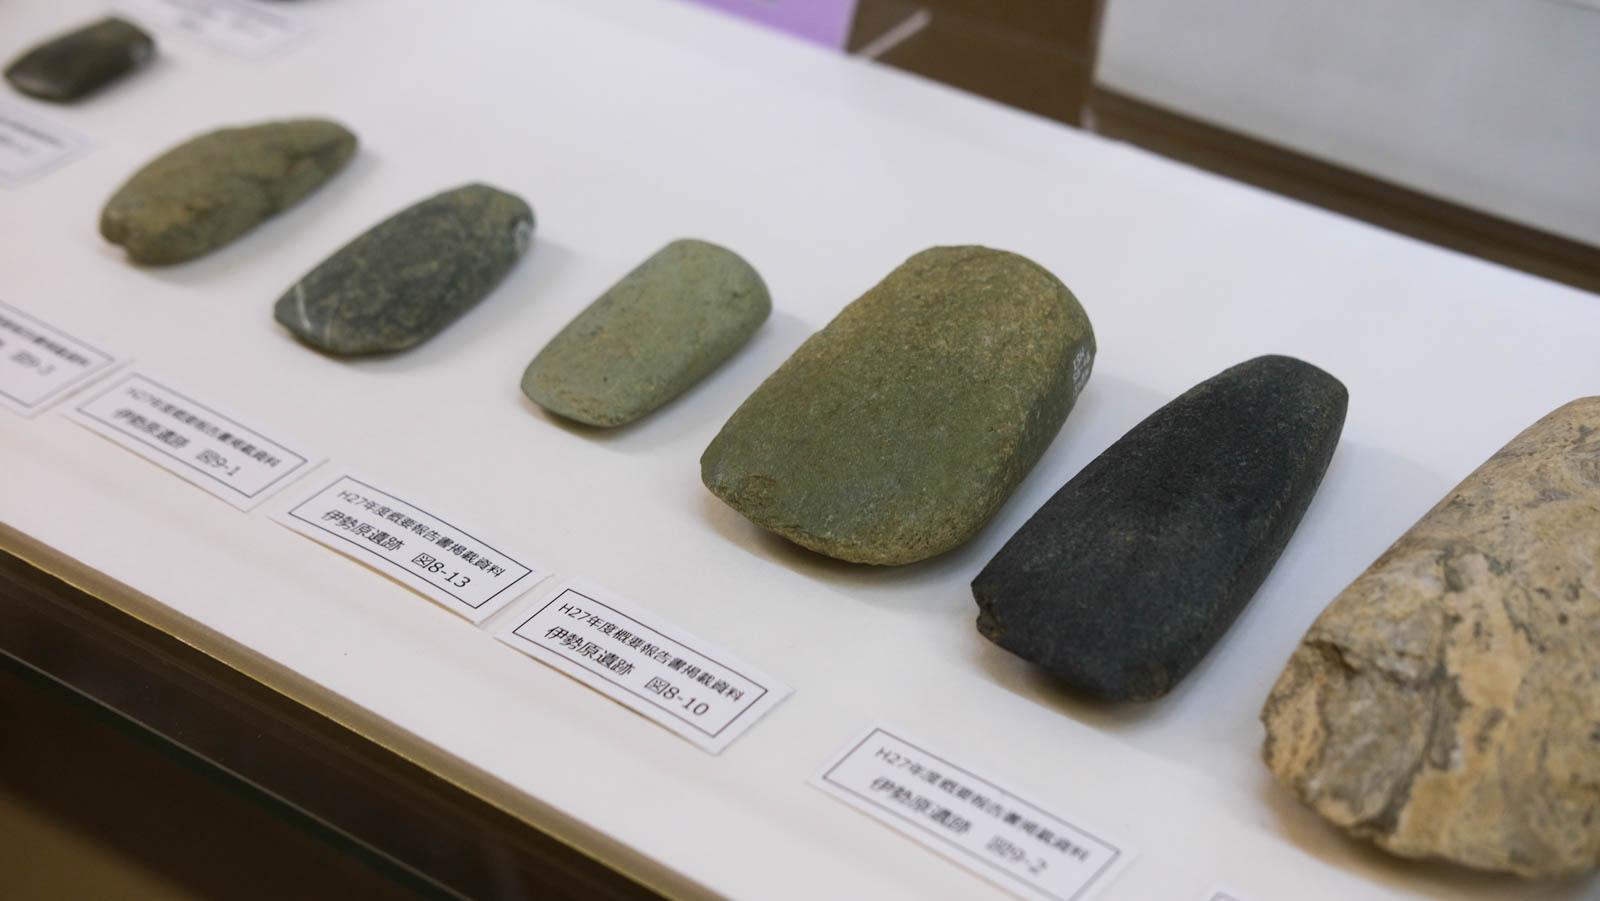 縄文時代の石斧